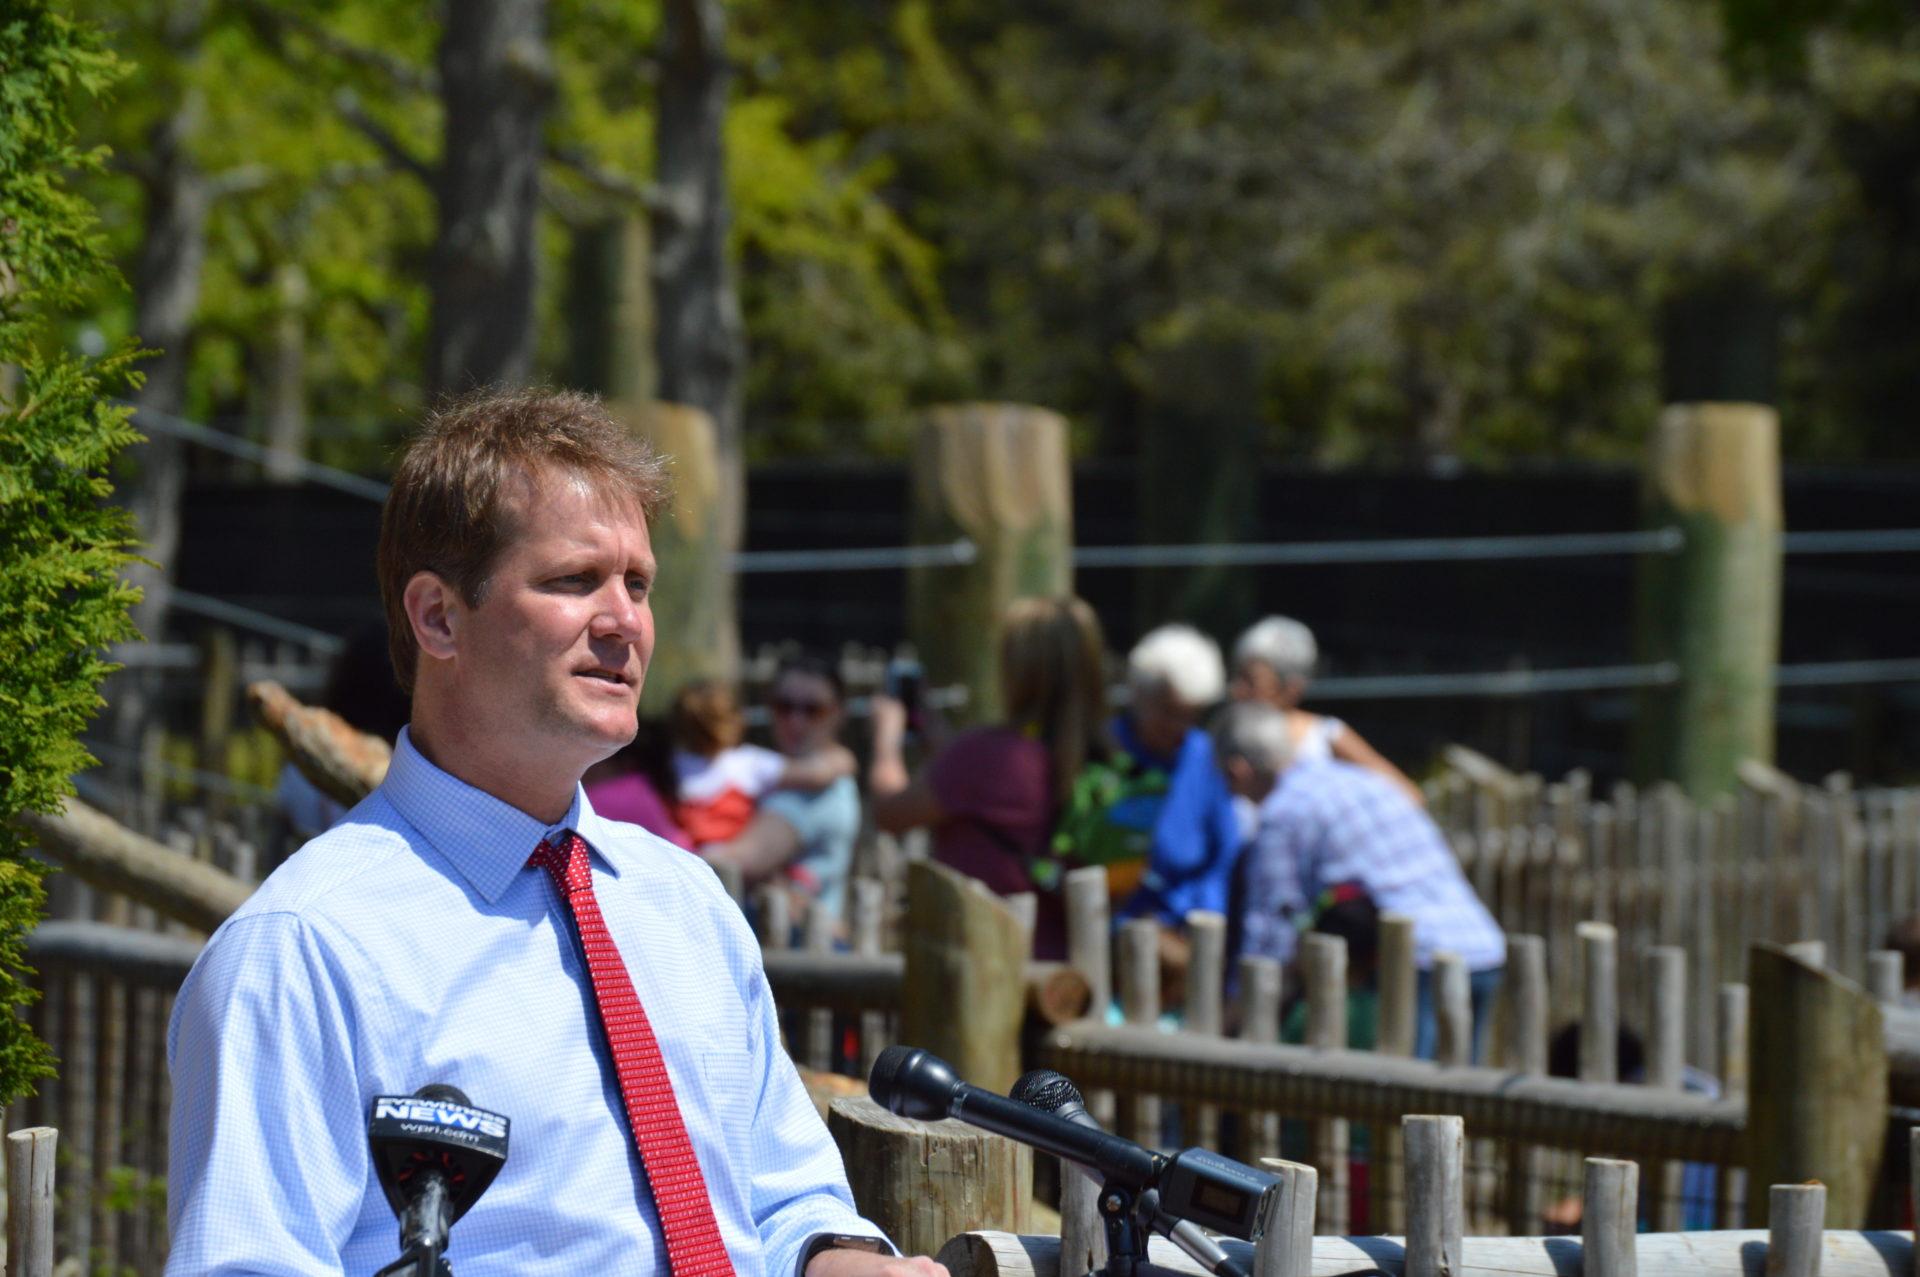 Buttonwood Park Zoo gives sneak peek of new exhibit